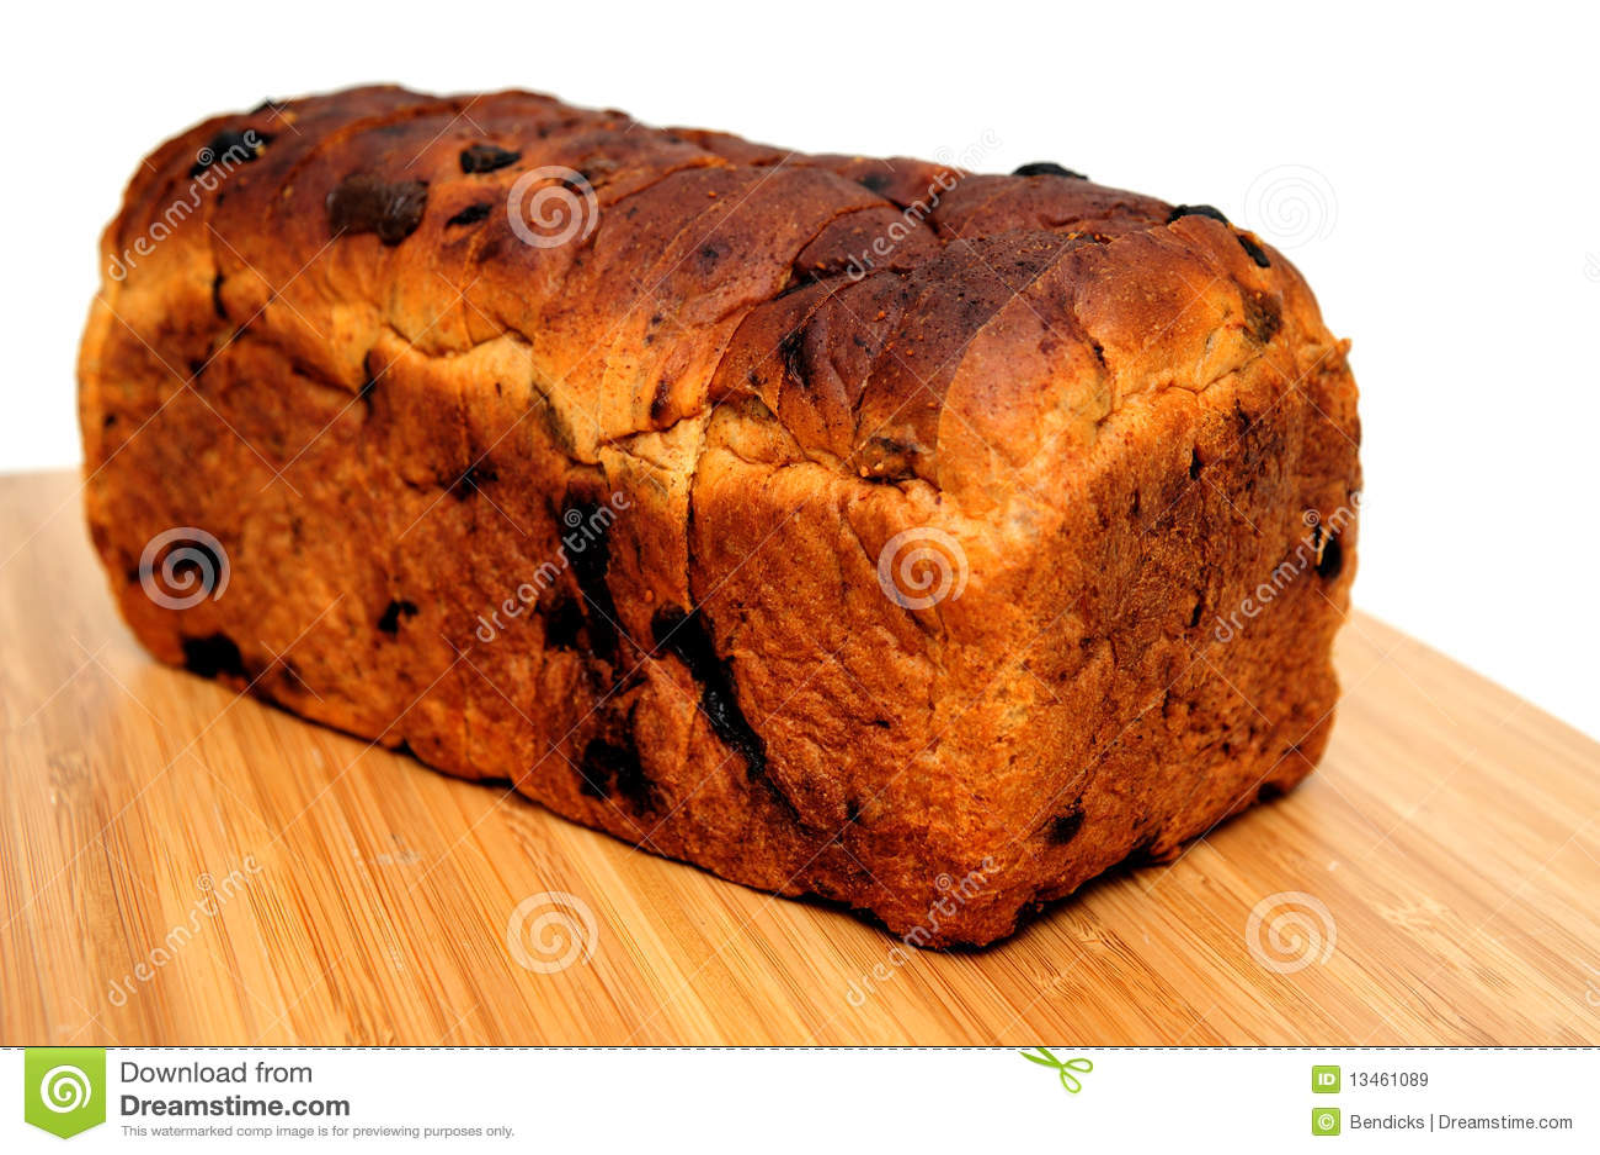 Raisin Cinnamon Bread Loaf Royalty Free Stock Images - Image: 13461089